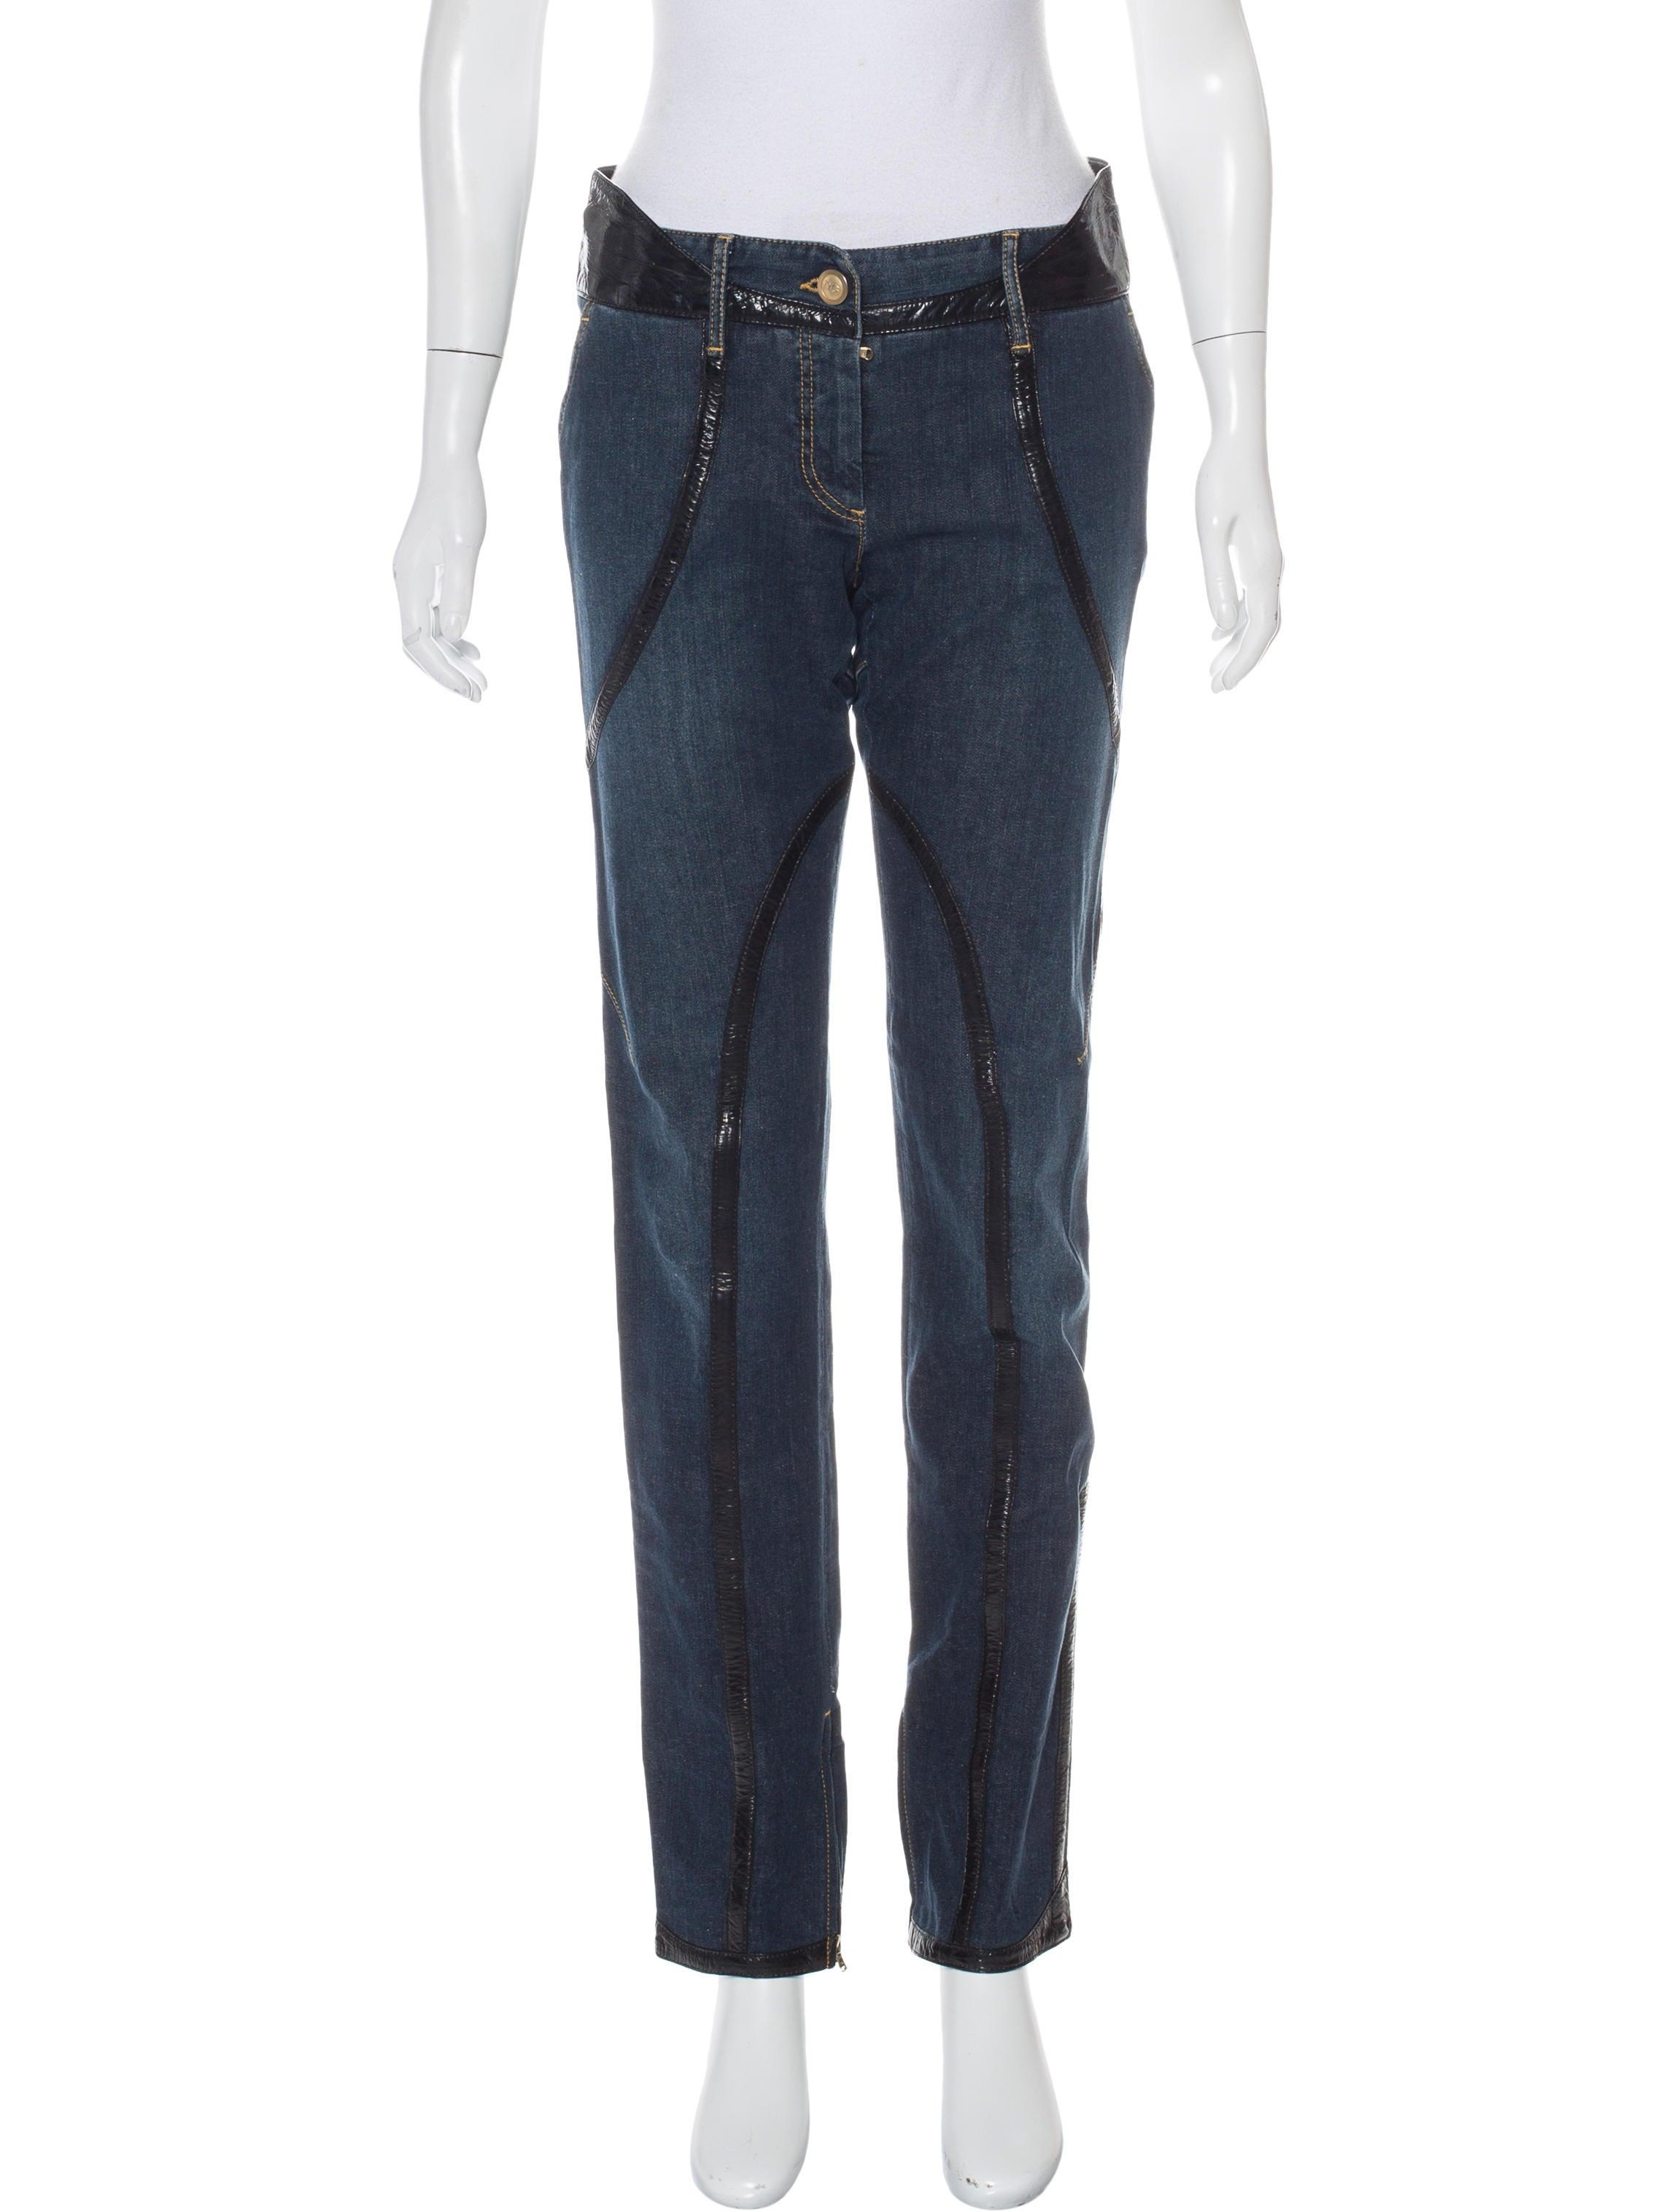 dolce gabbana embellished straight leg jeans clothing dag79721 the realreal. Black Bedroom Furniture Sets. Home Design Ideas